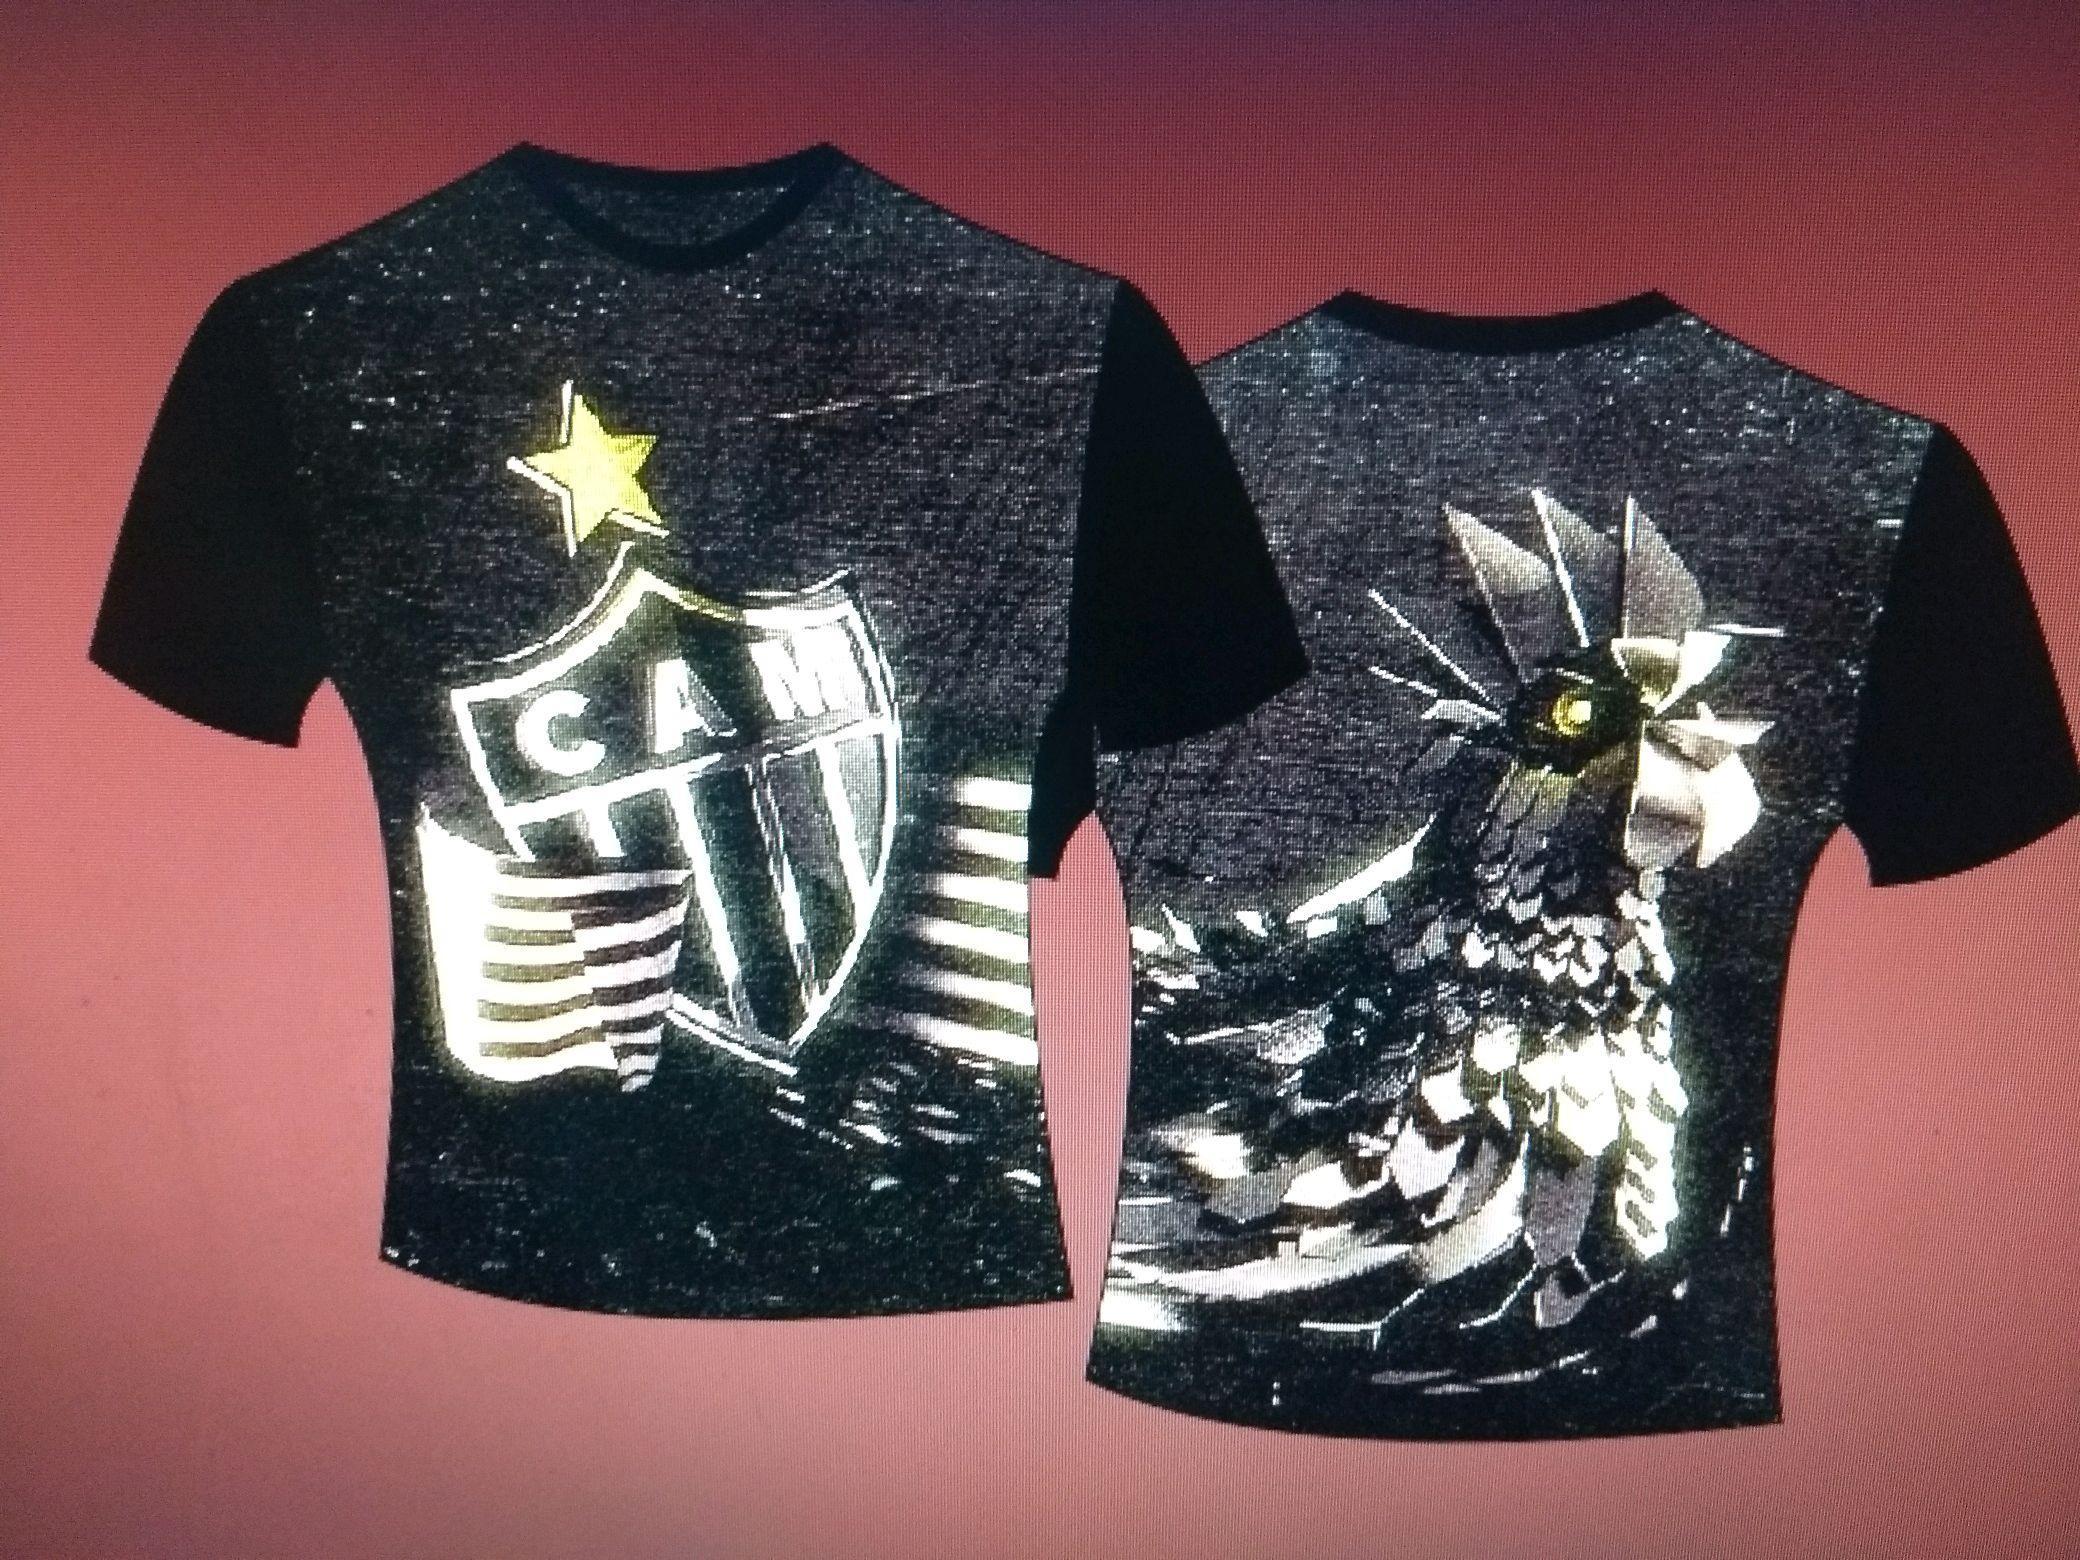 c316ac6f04 Camiseta Feminina Atletico Mineiro